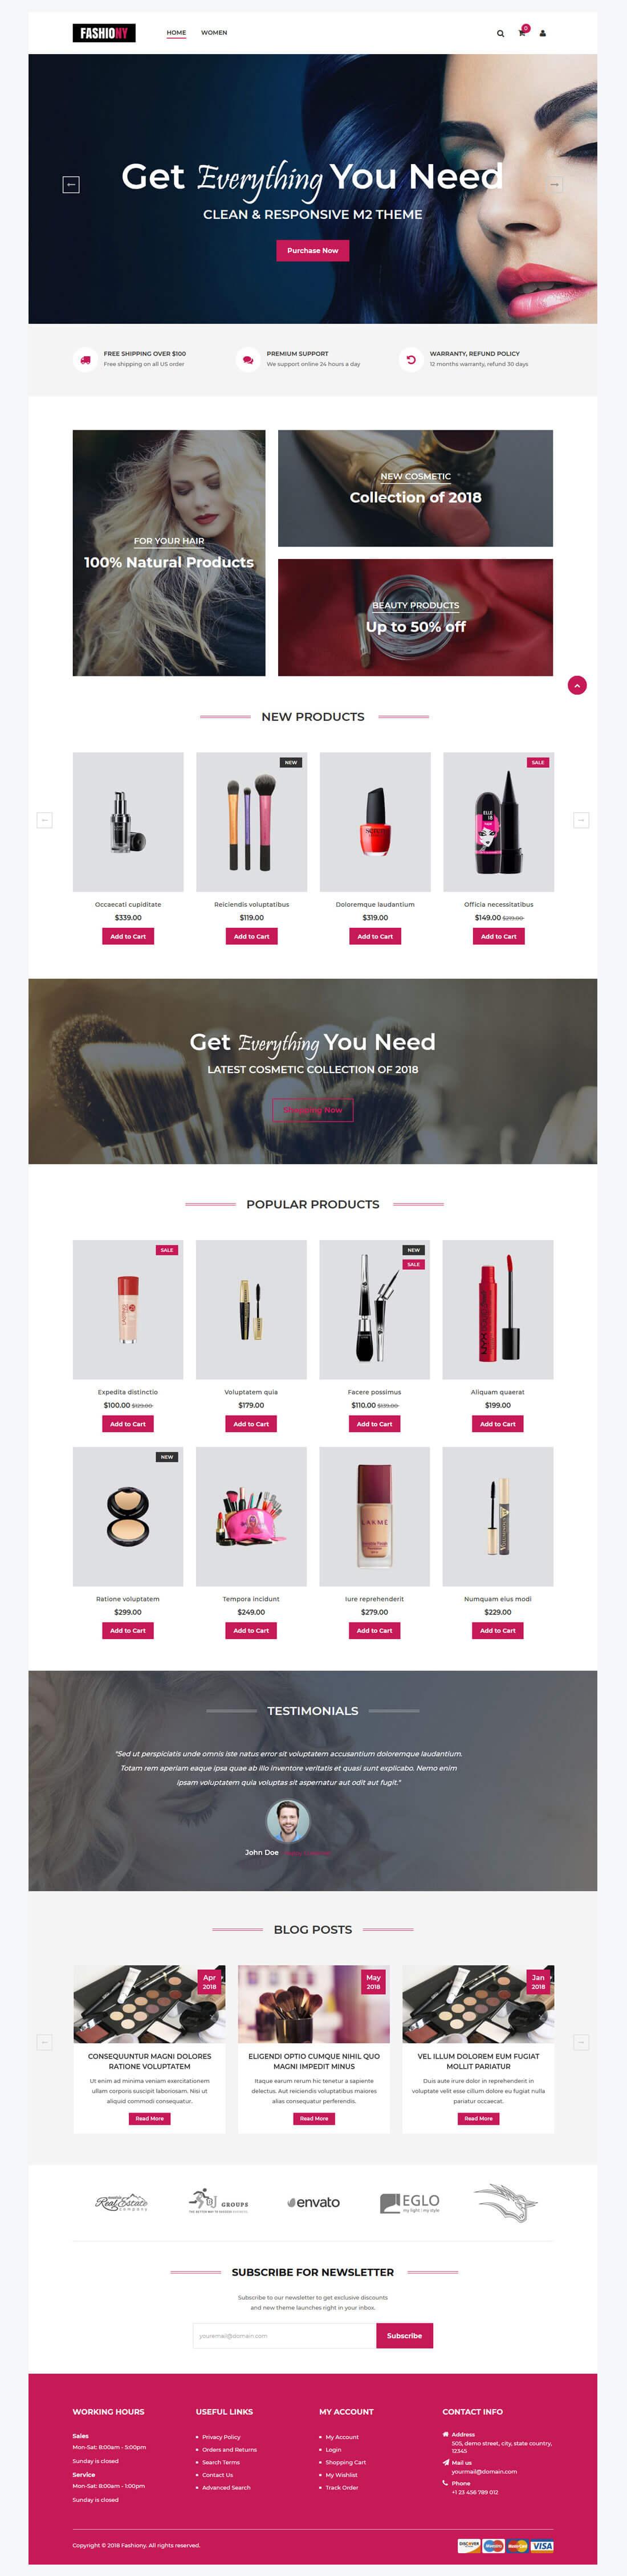 Fashiony - Home Page Overview